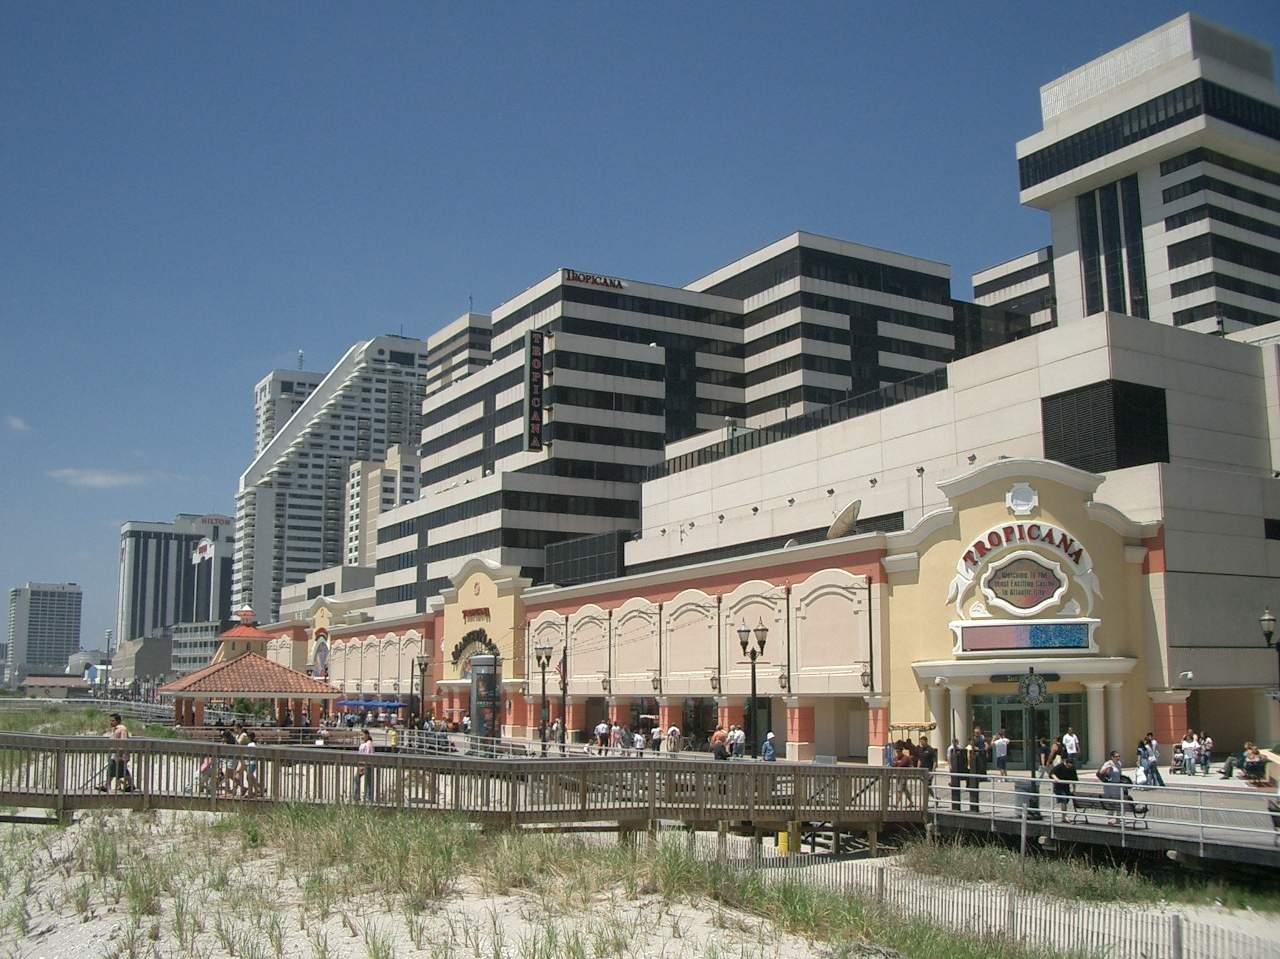 Atlantic City (NJ) United States  city photo : GLOBE IN THE BLOG: Atlantic City, New Jersey, United States of America